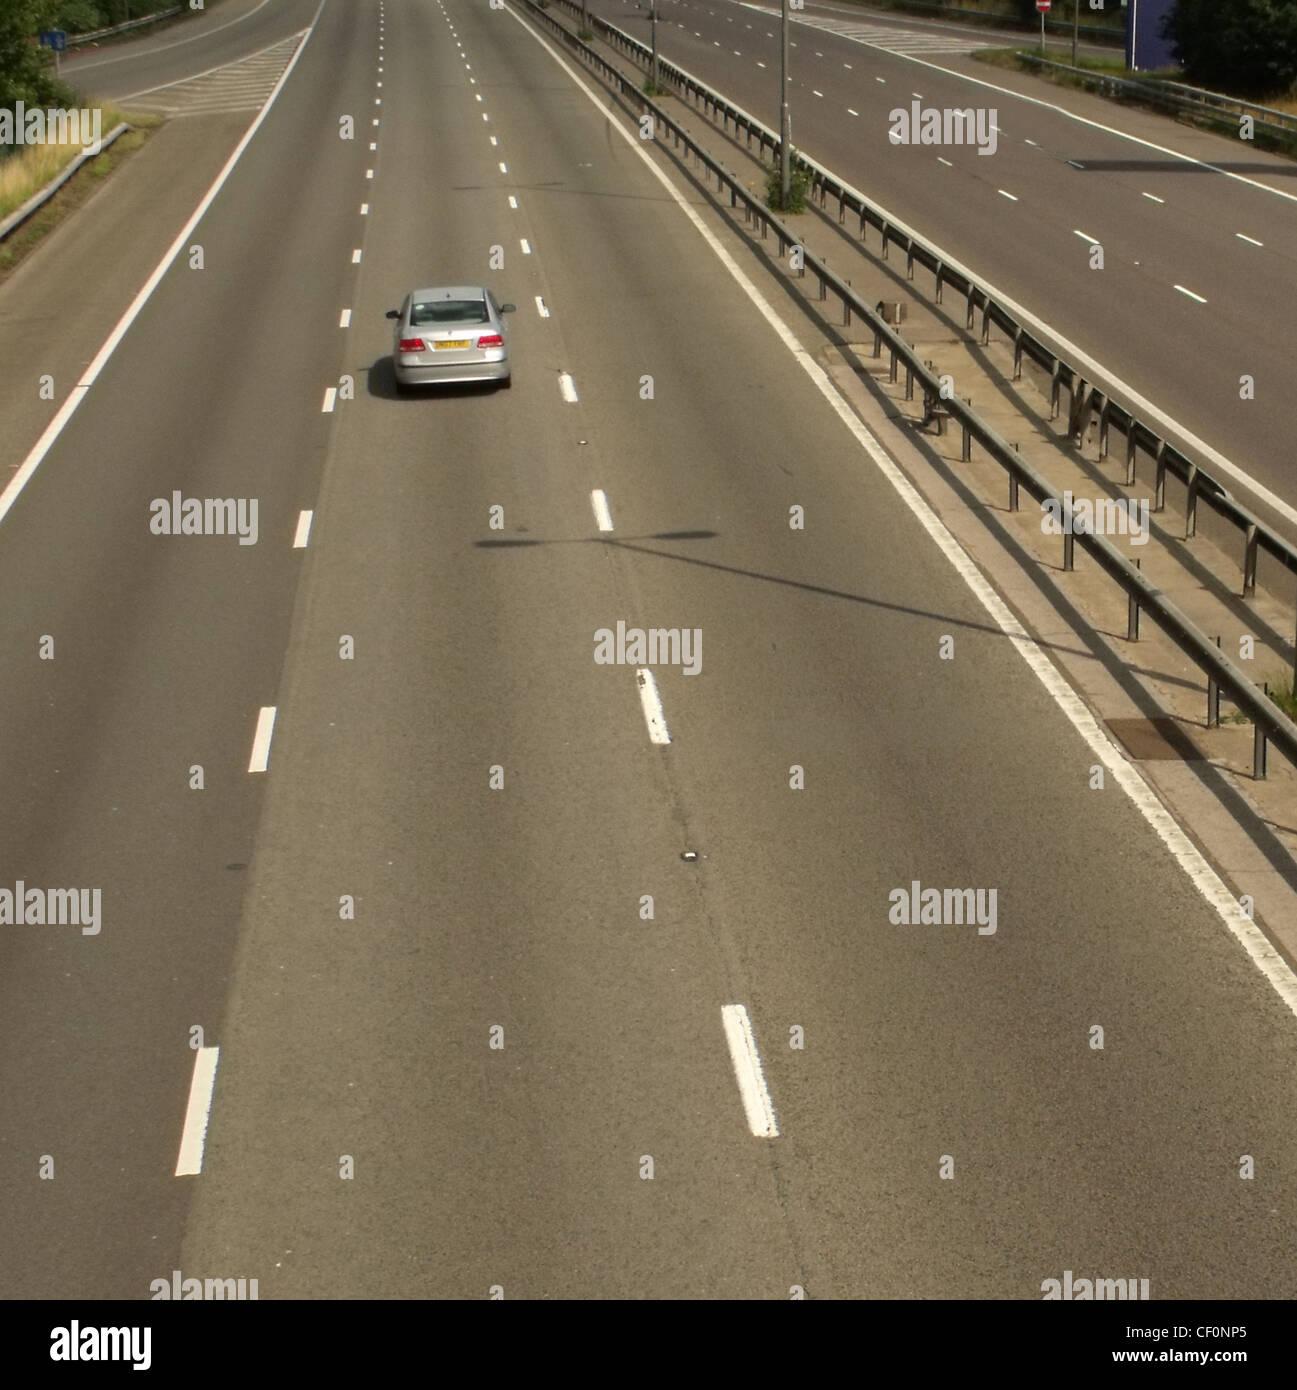 Single car on M1 at Watford Gap services,M1 Motorway,Northamptonshire,England UK road network gotonysmith,gotonysmith,Buy Pictures of,Buy Images Of